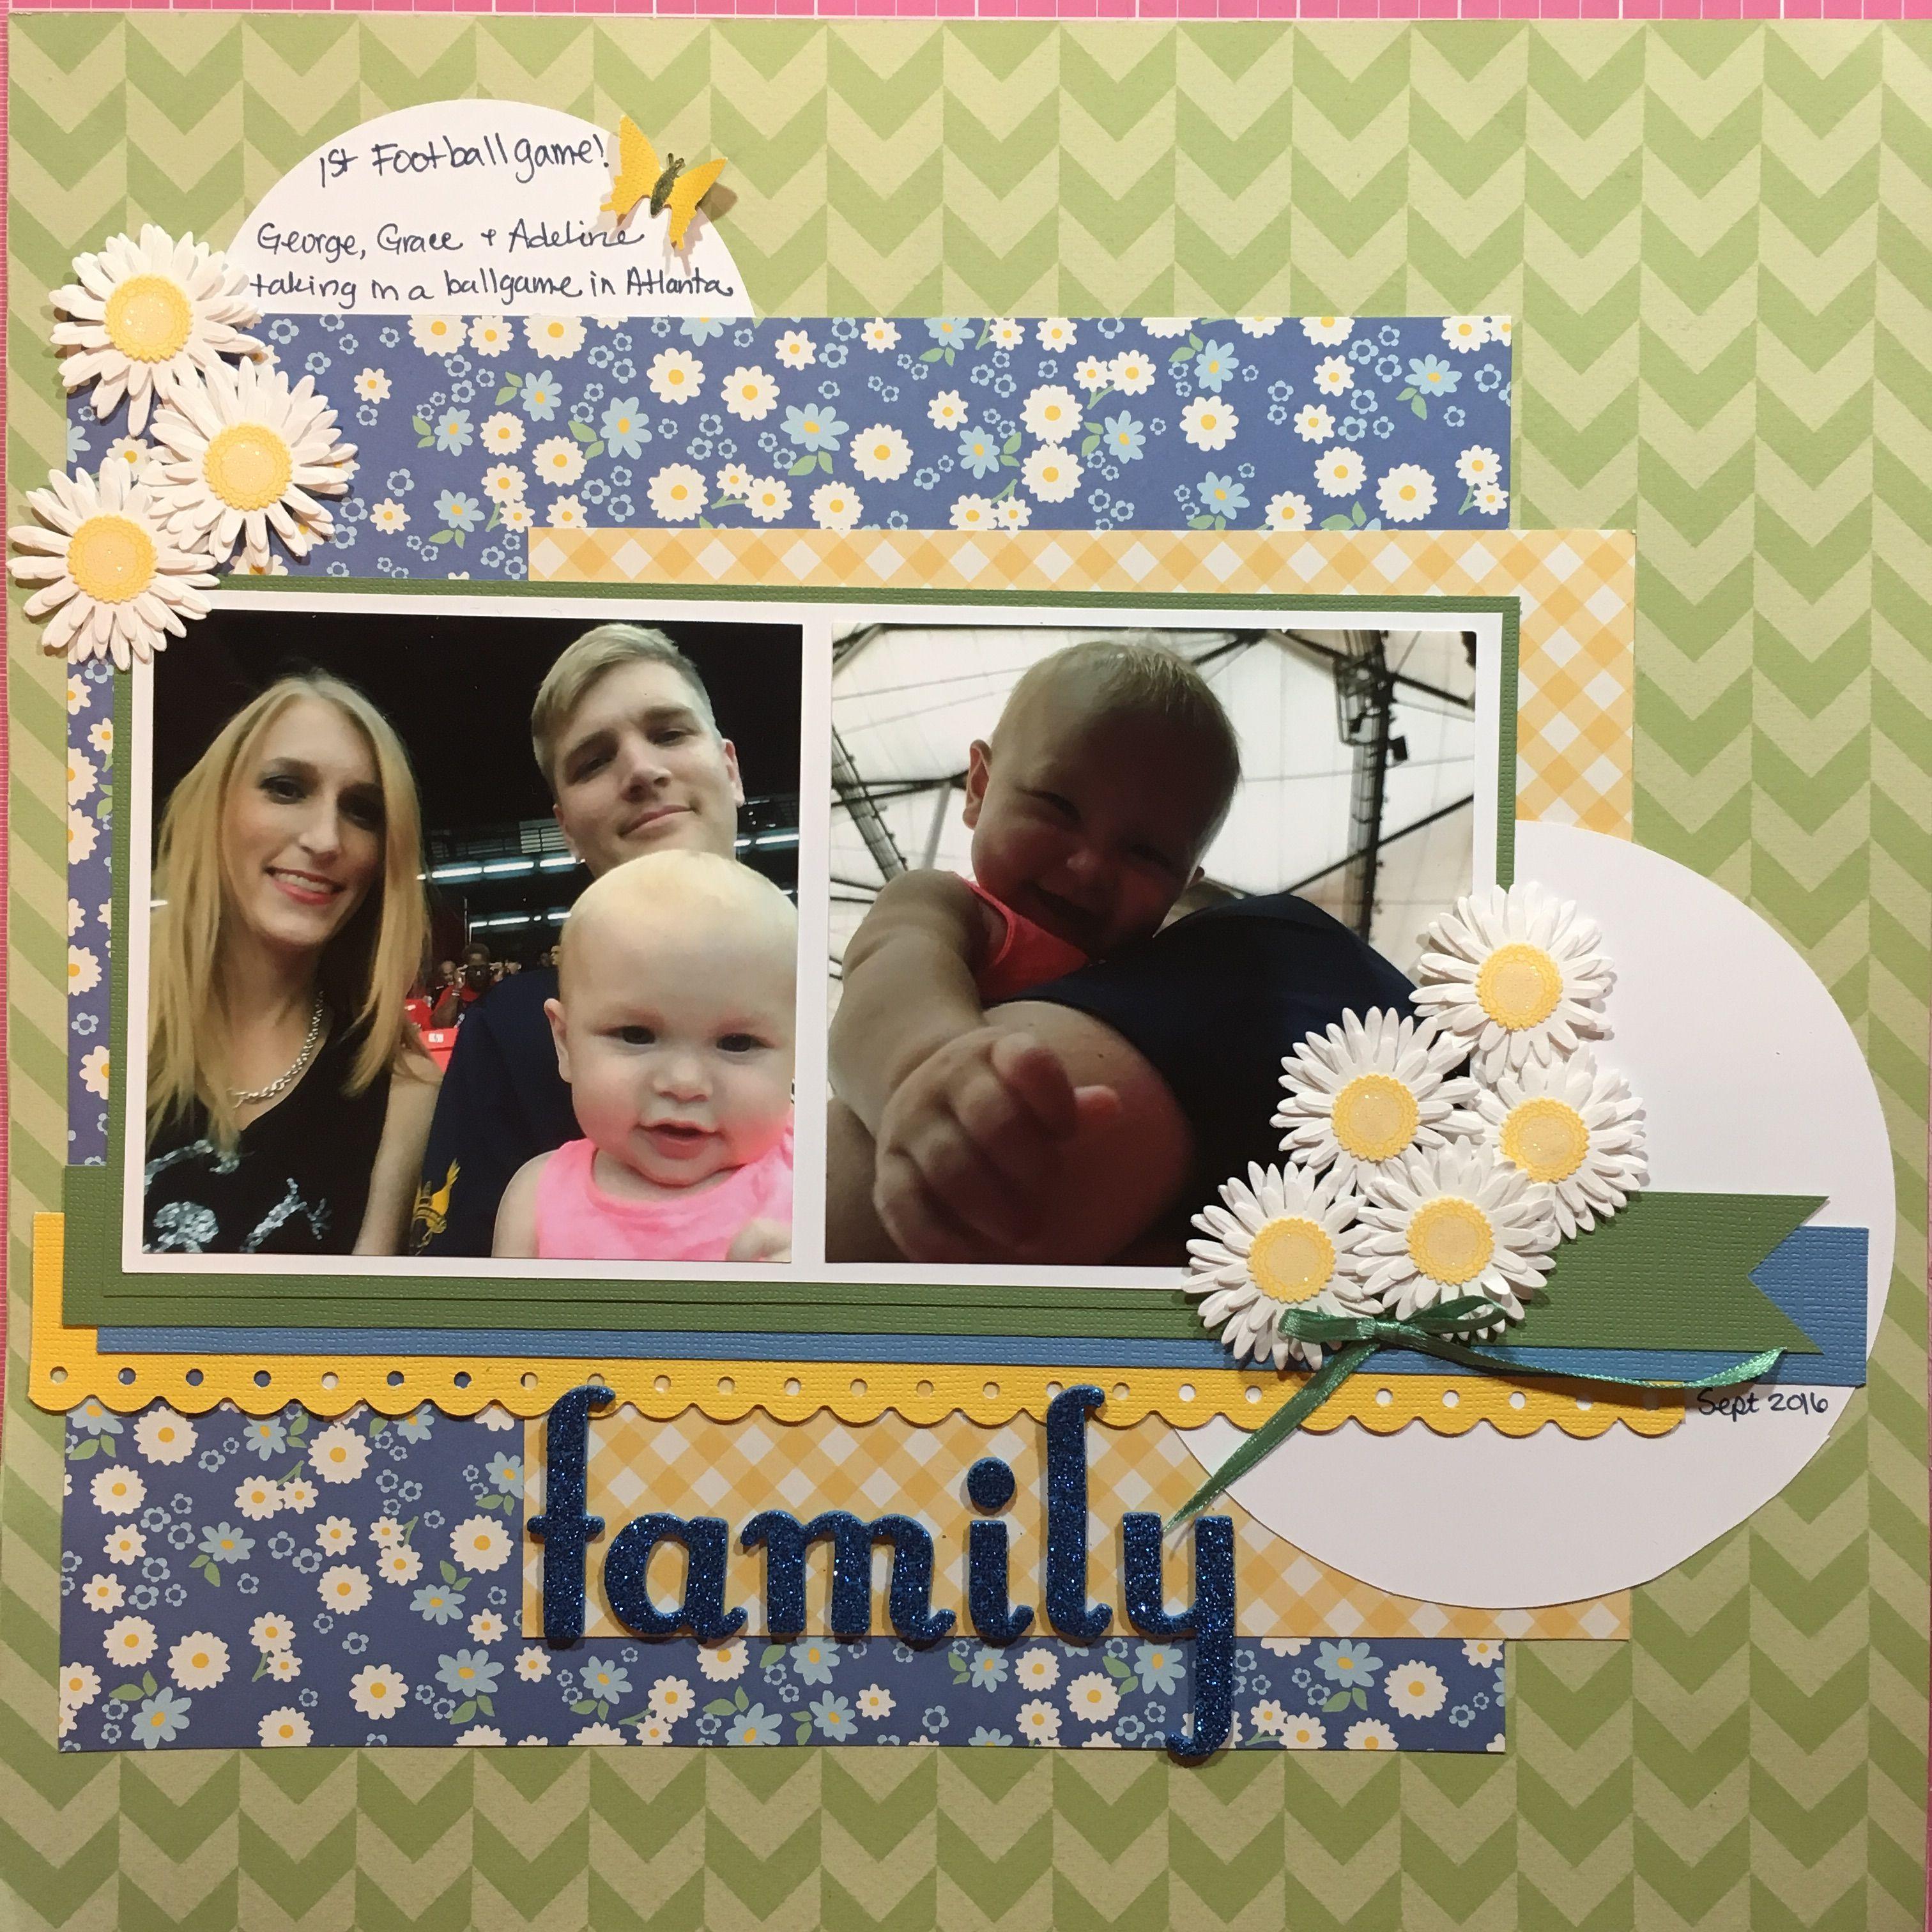 Family scrapbook ideas on pinterest - Family Scrapbook Com